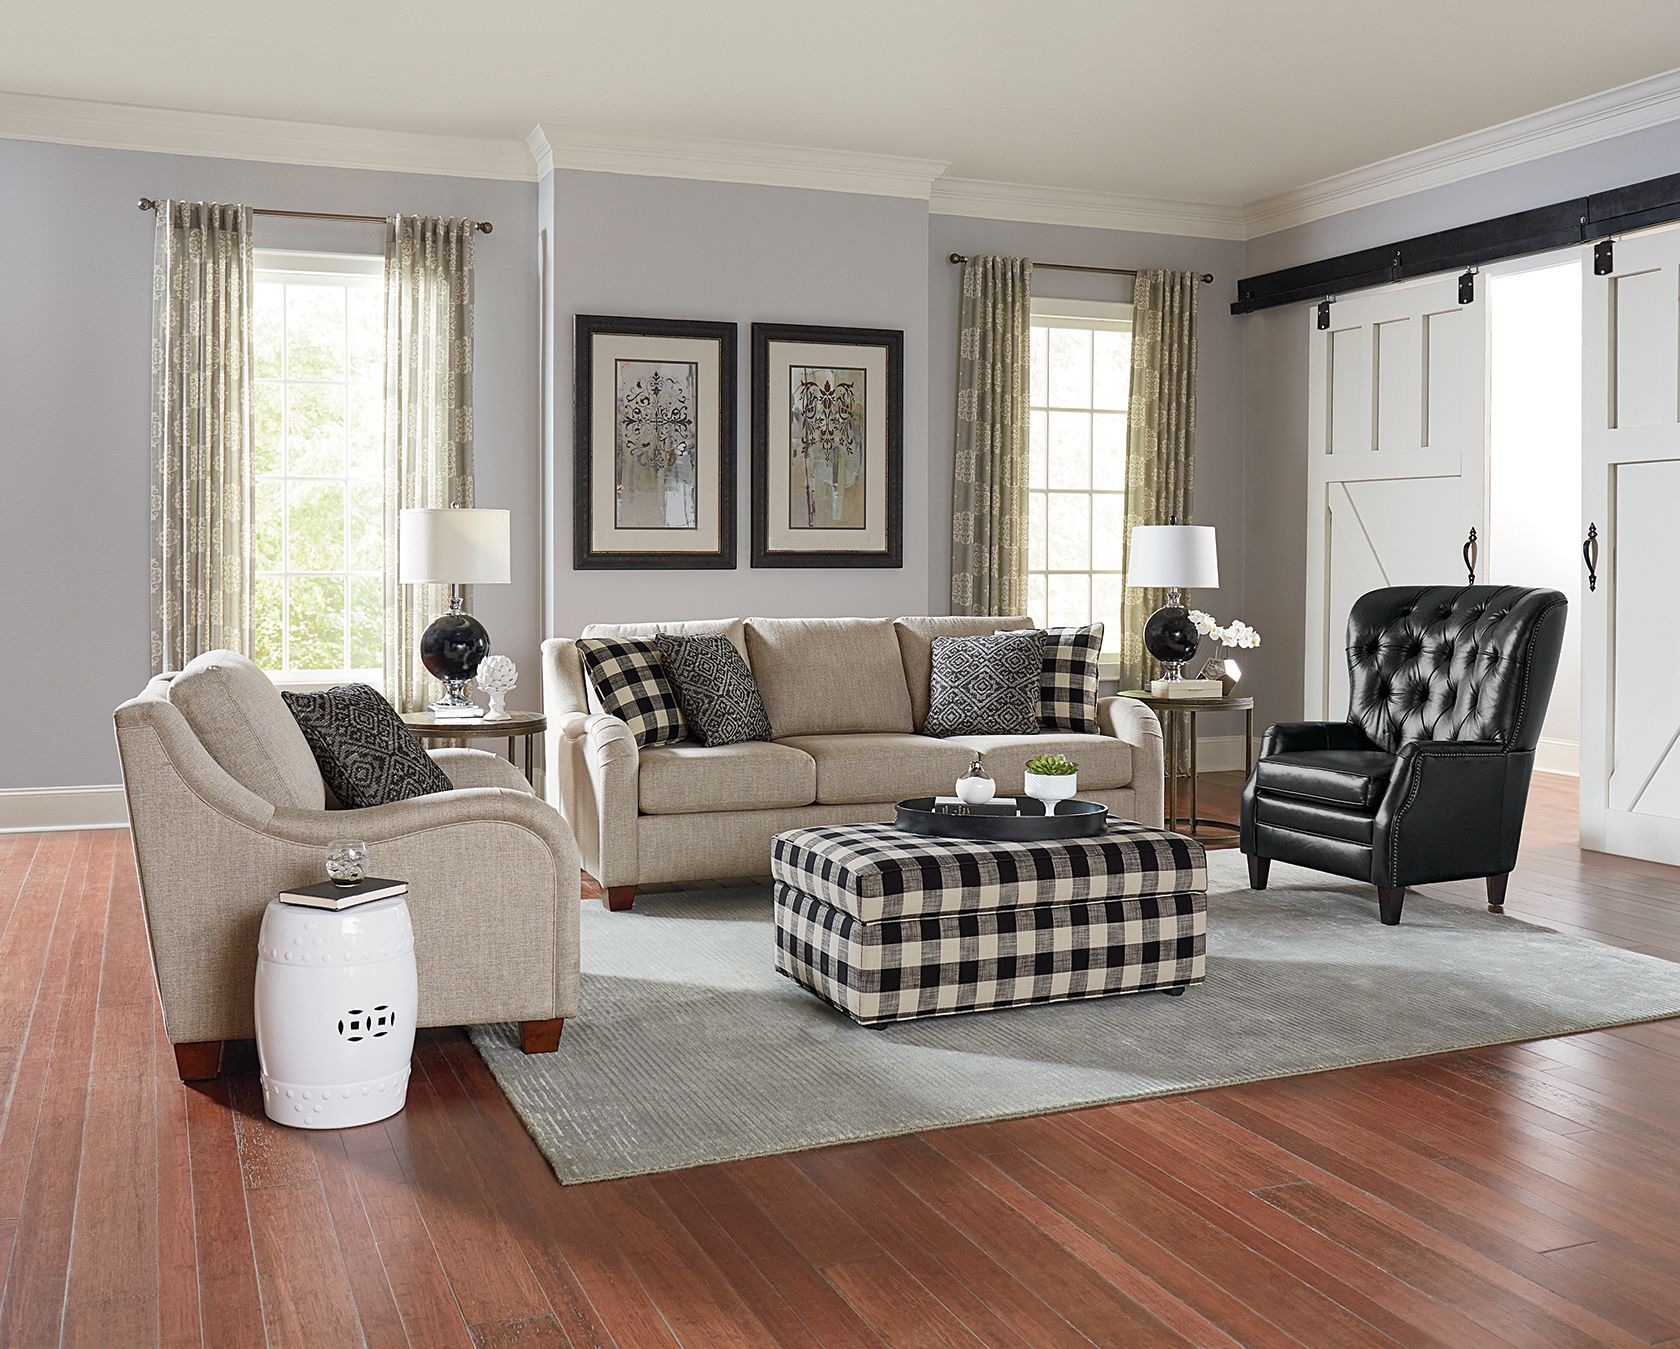 best family sofas uk cane sofa set olx bangalore aria collection 6h00 england furniture